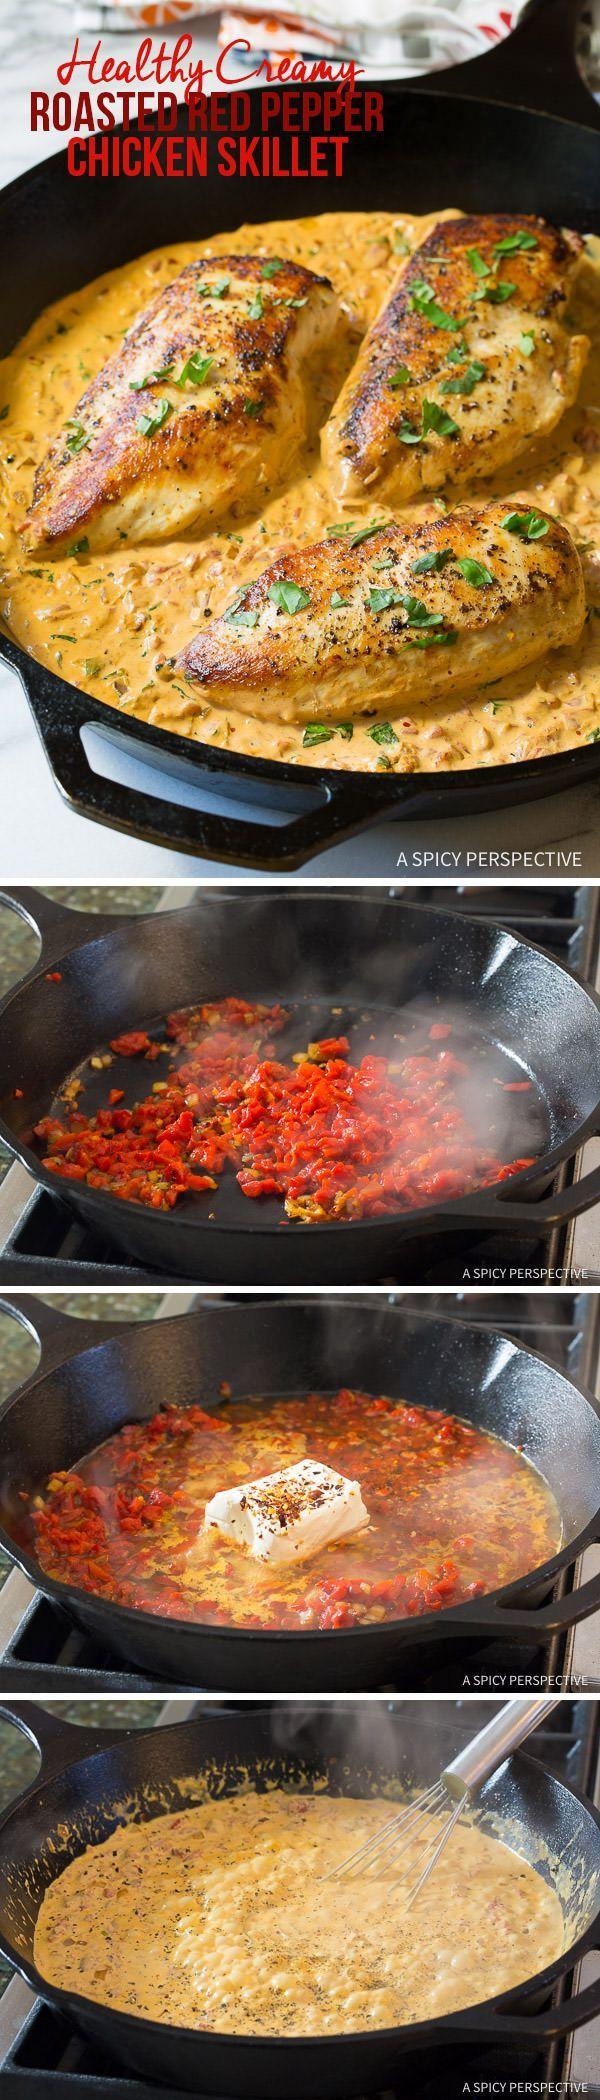 Creamy Roasted Red Pepper Chicken Skillet Recipe